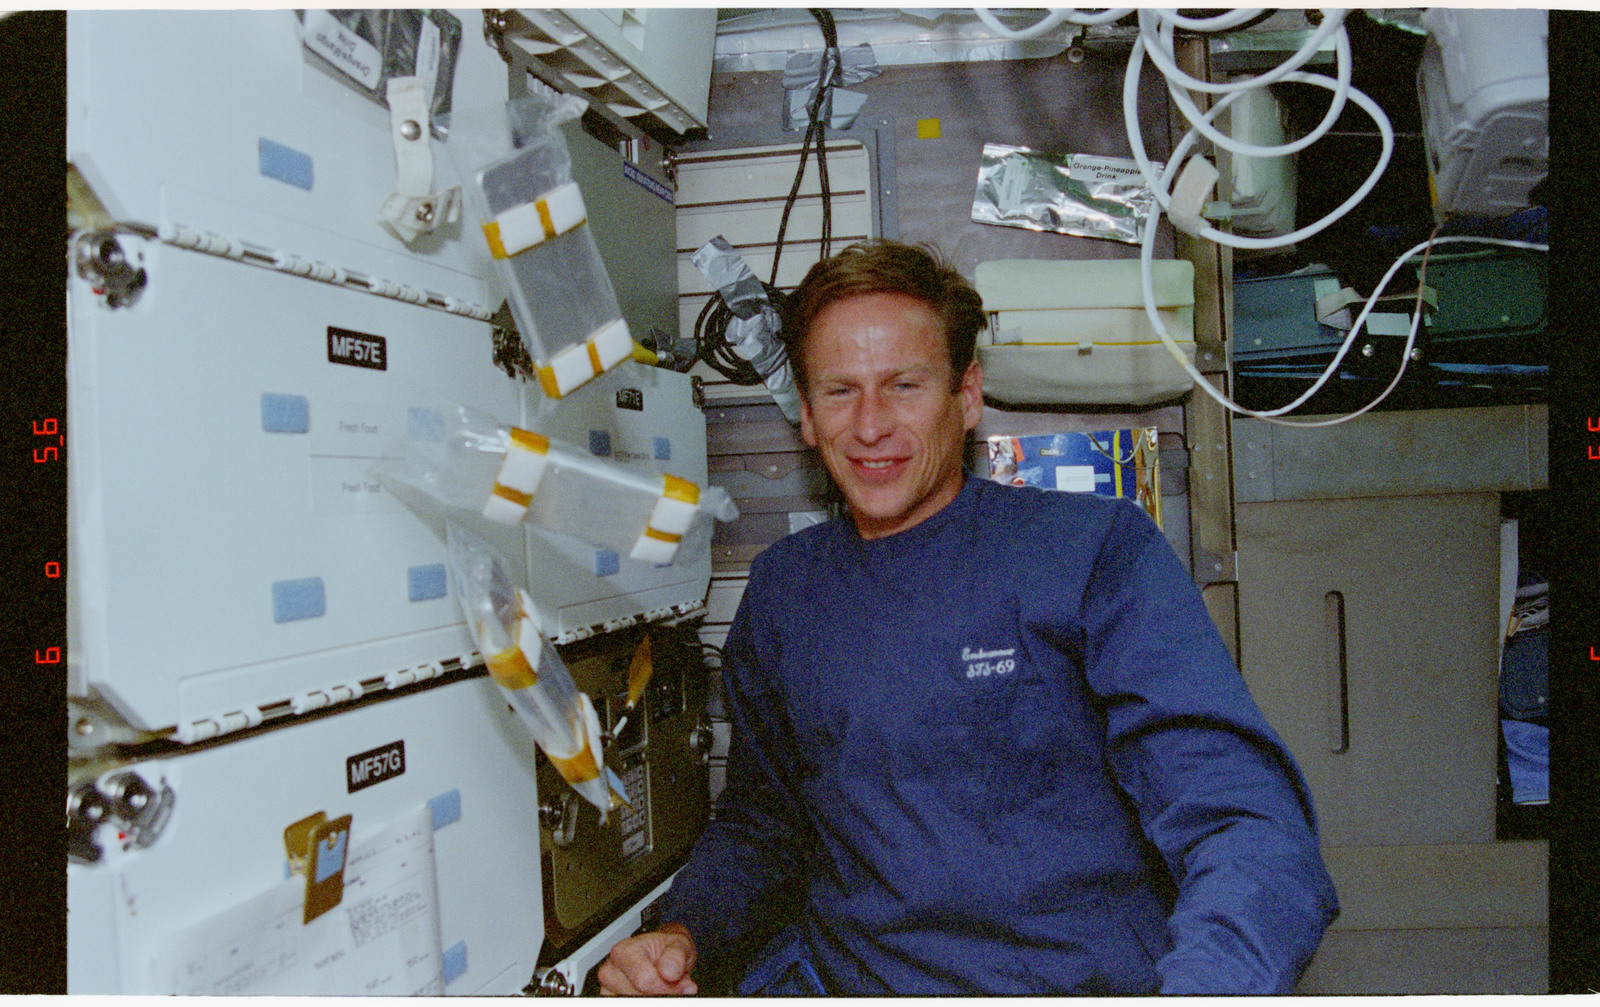 STS069-301-031 - STS-069 - CMIX-04